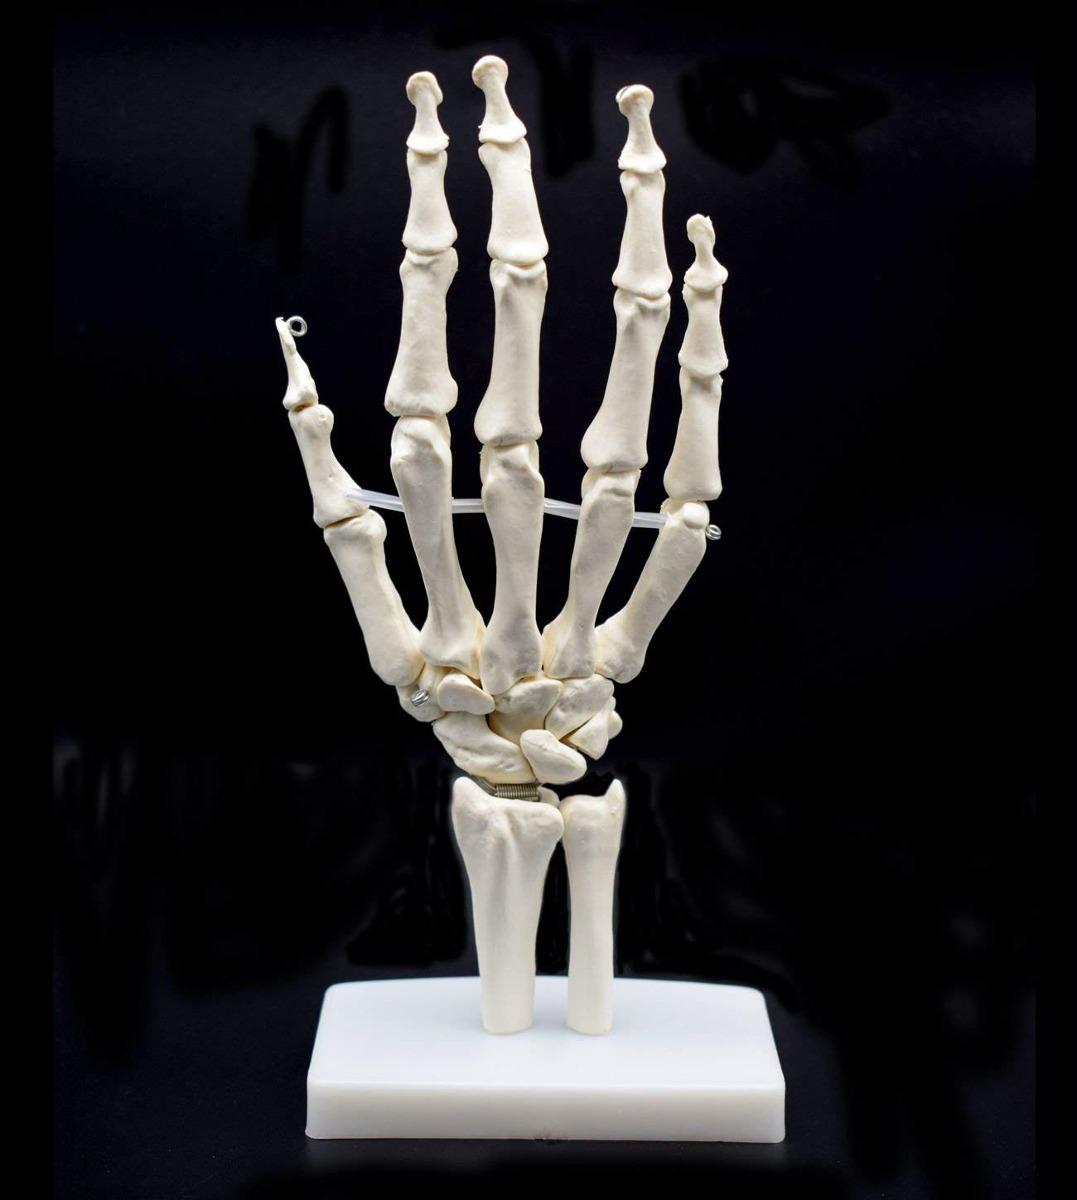 Modelo Del Esqueleto Humano Sobre La Base De La Mano, La Man ...